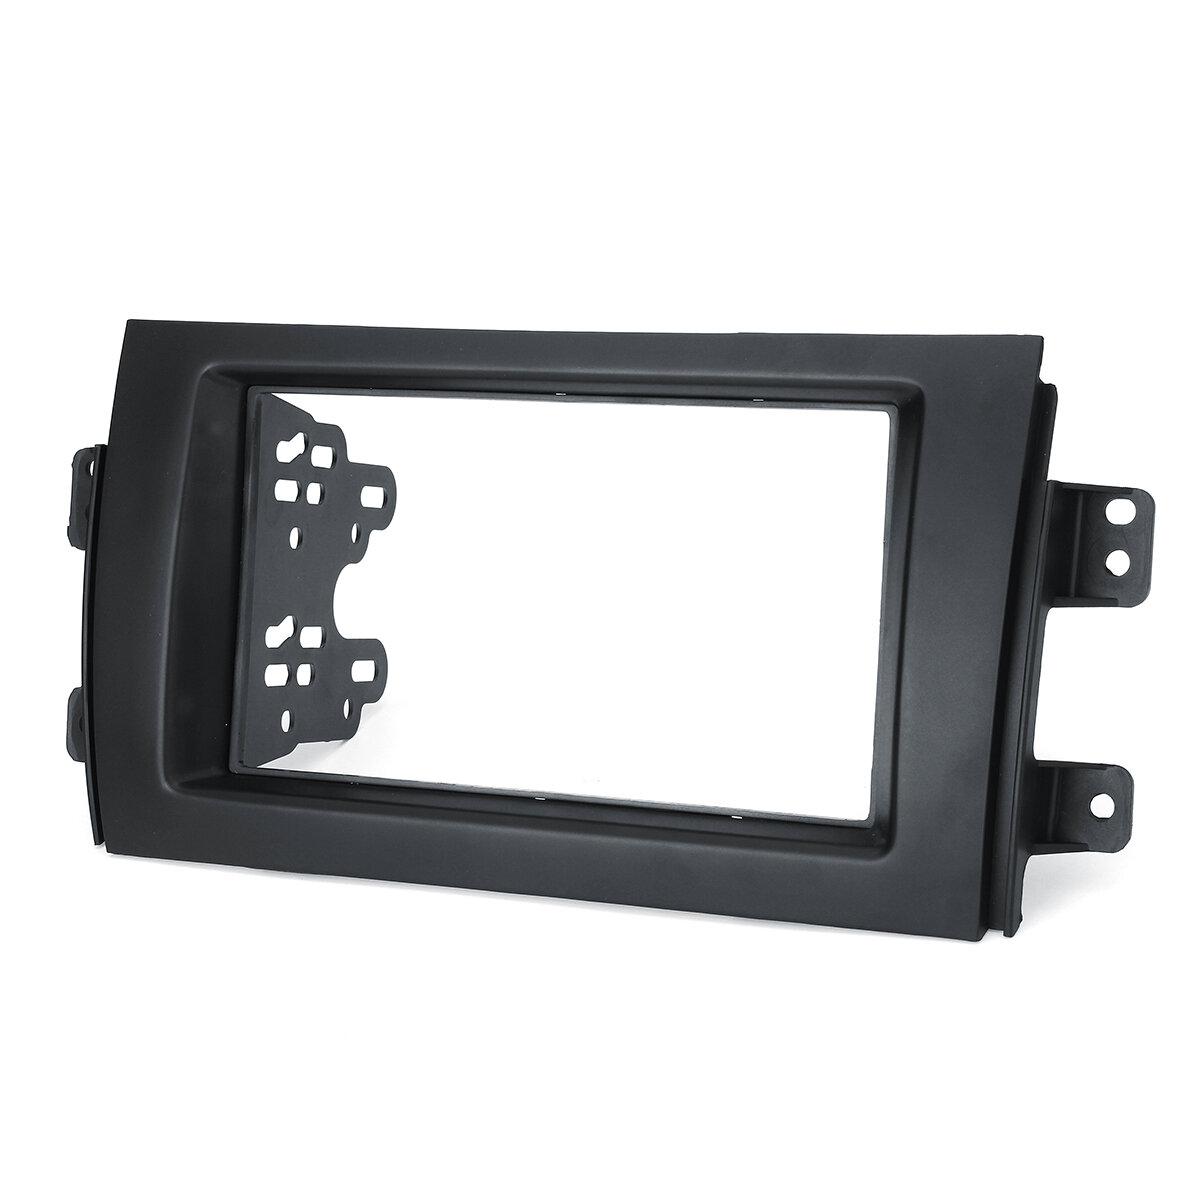 2Din Car Radio Stereo Fascia Trim Panel Plate Adapter For Suzuki/Fiat